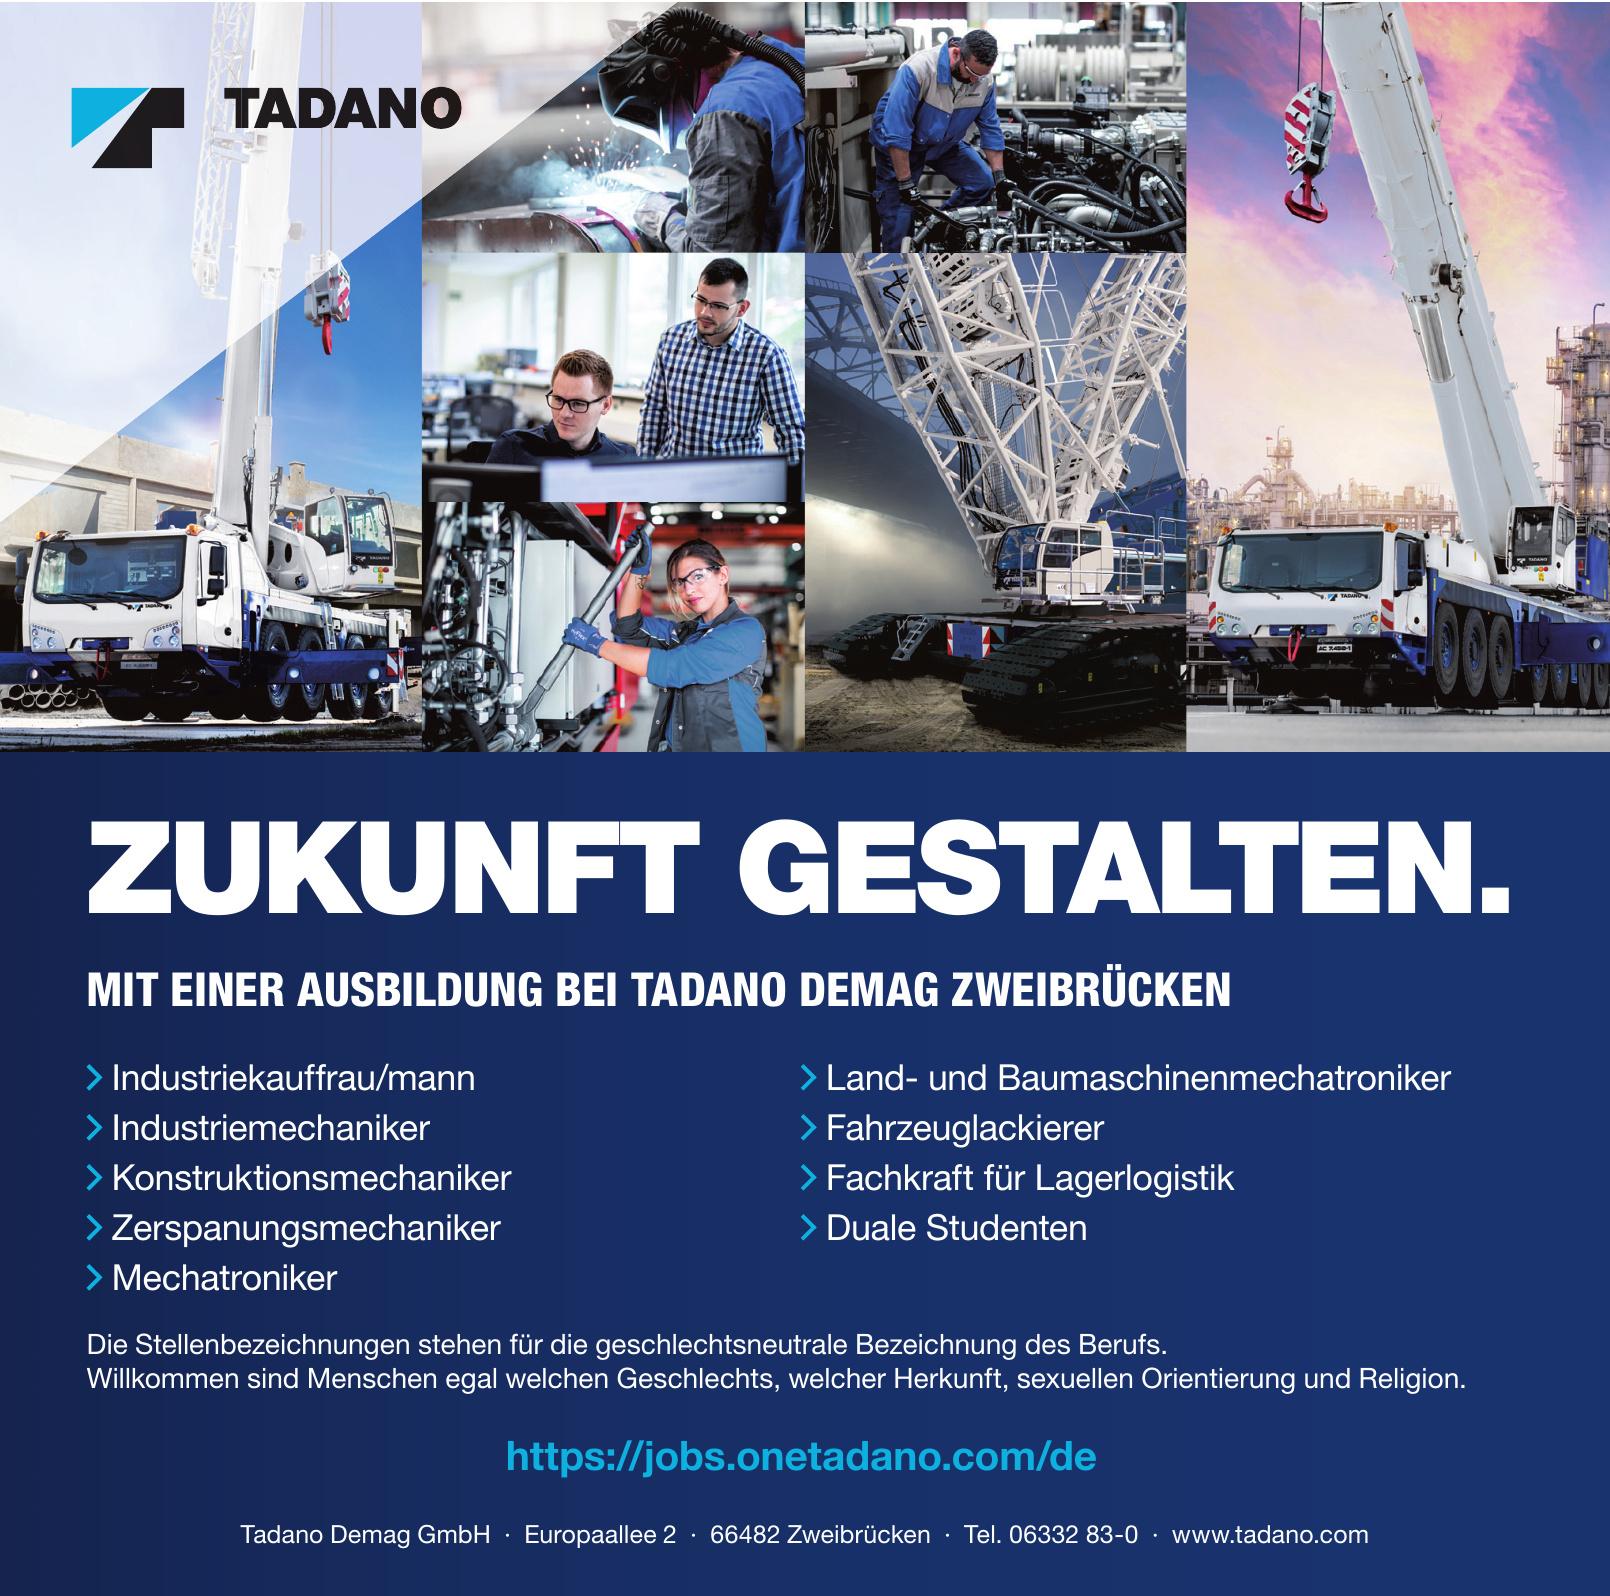 Tadano Demag GmbH